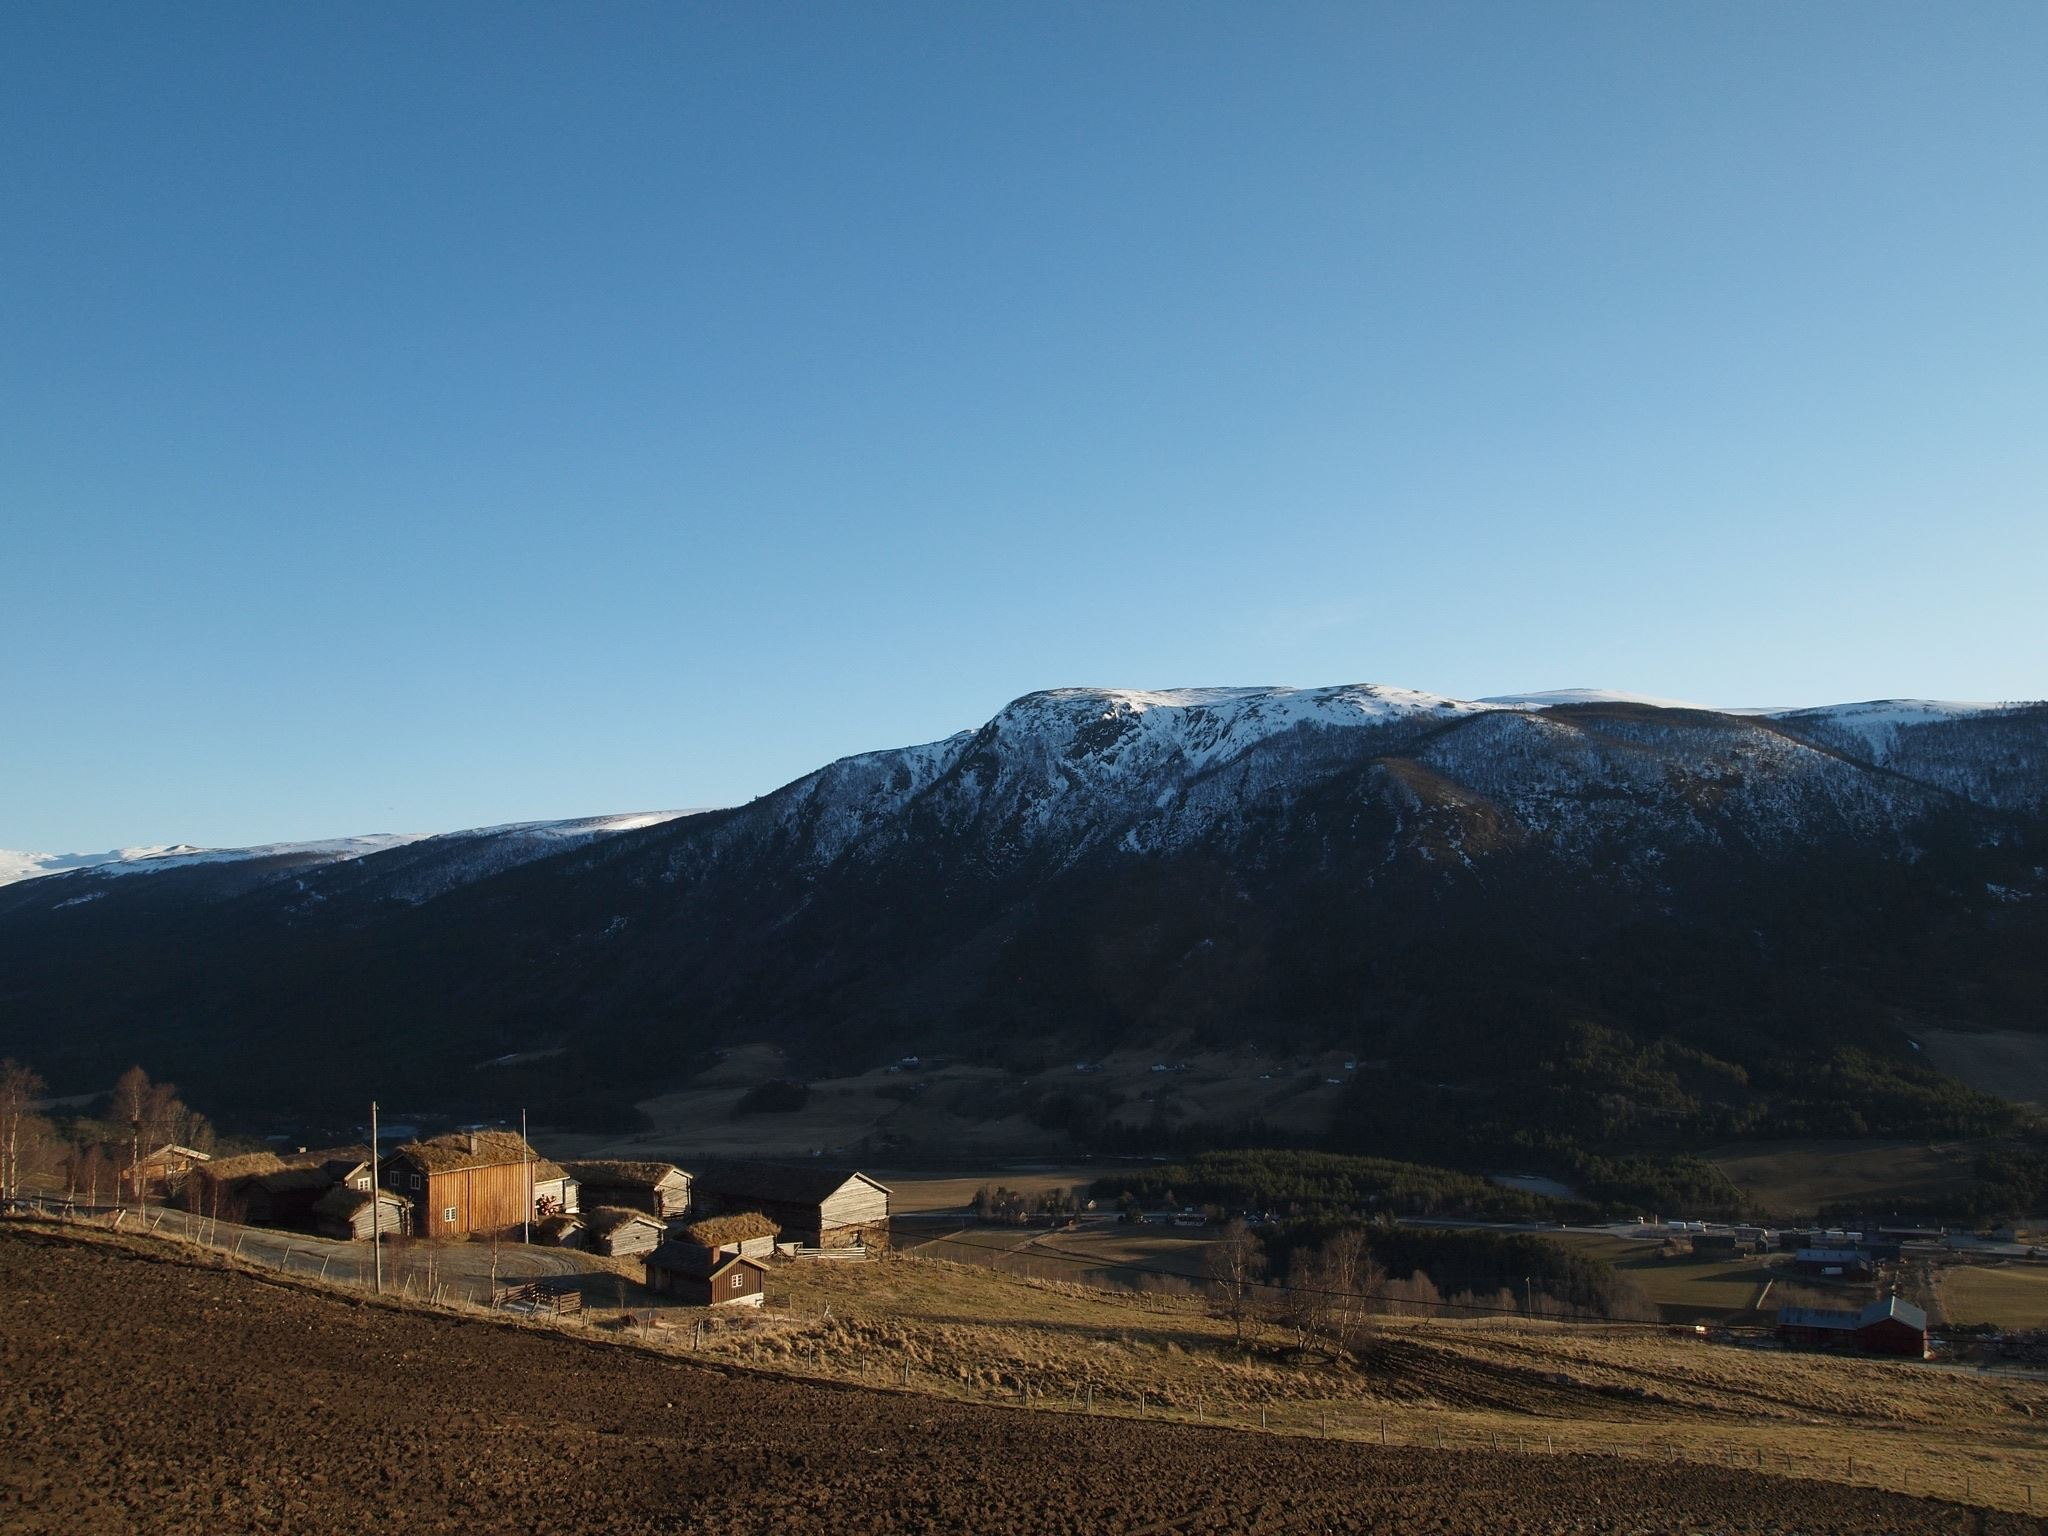 Budsjord, the pilgrim farm